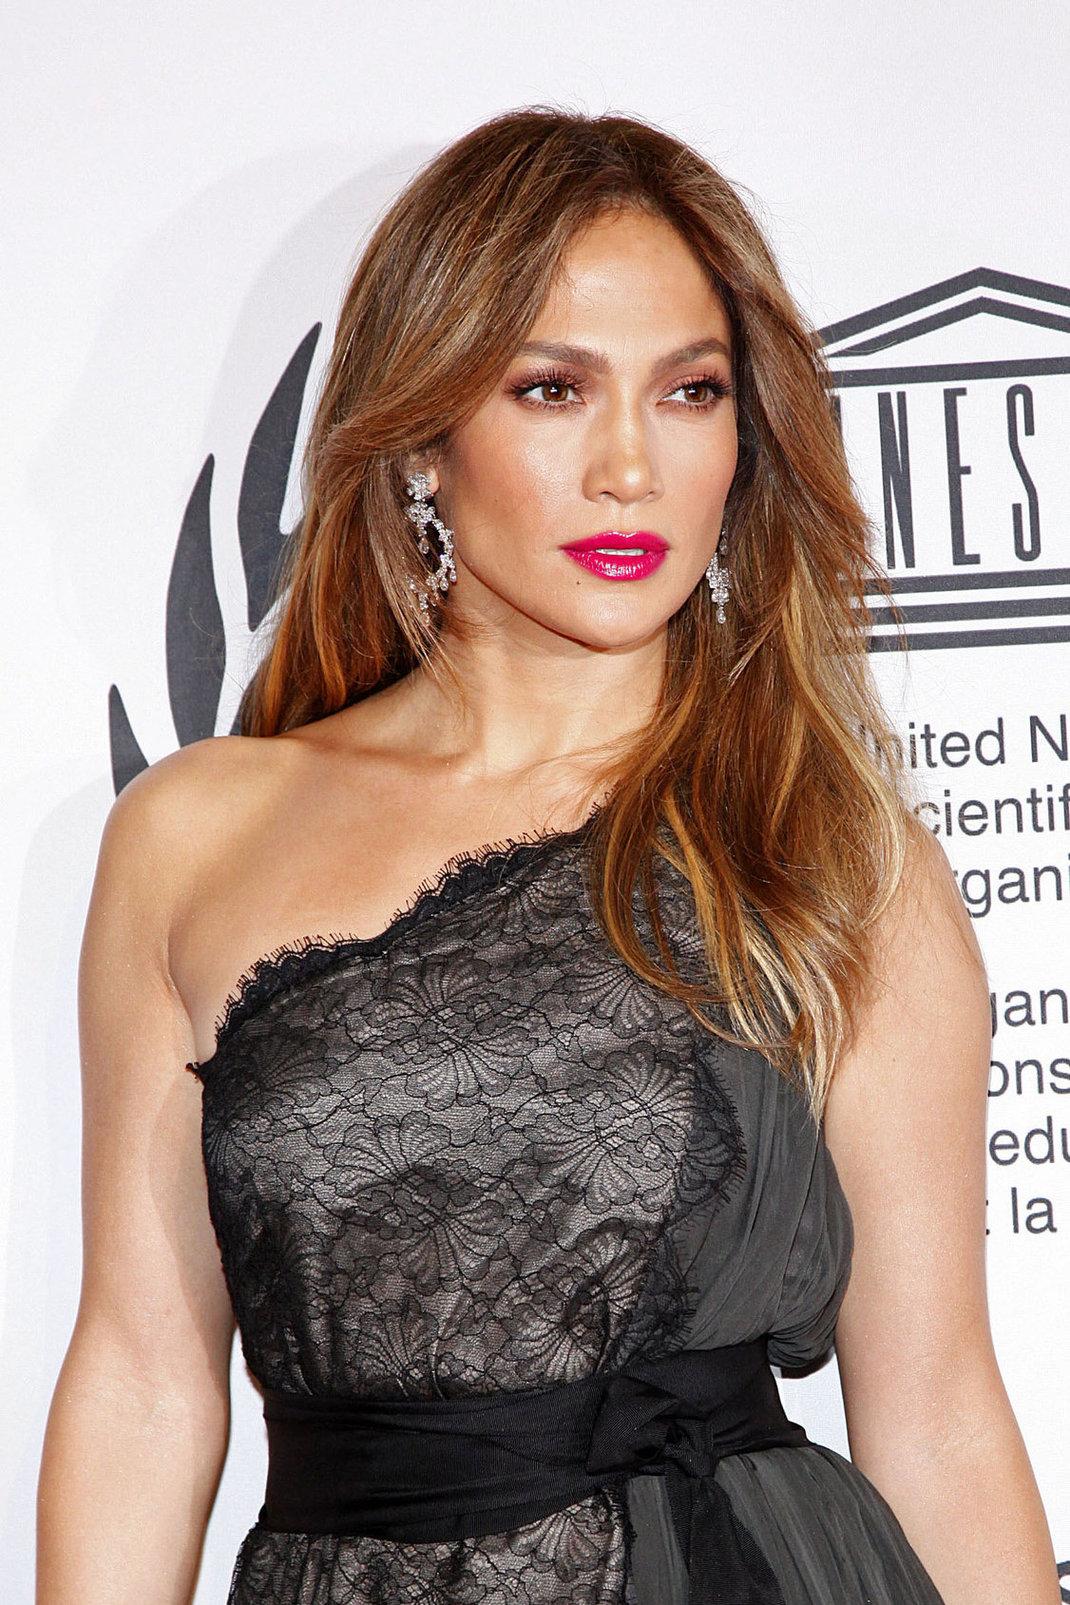 Jennifer Lopez UNESCO Charity Gala 2012 at the Maritim Hotel in Berlin, Germany on October 27, 2012